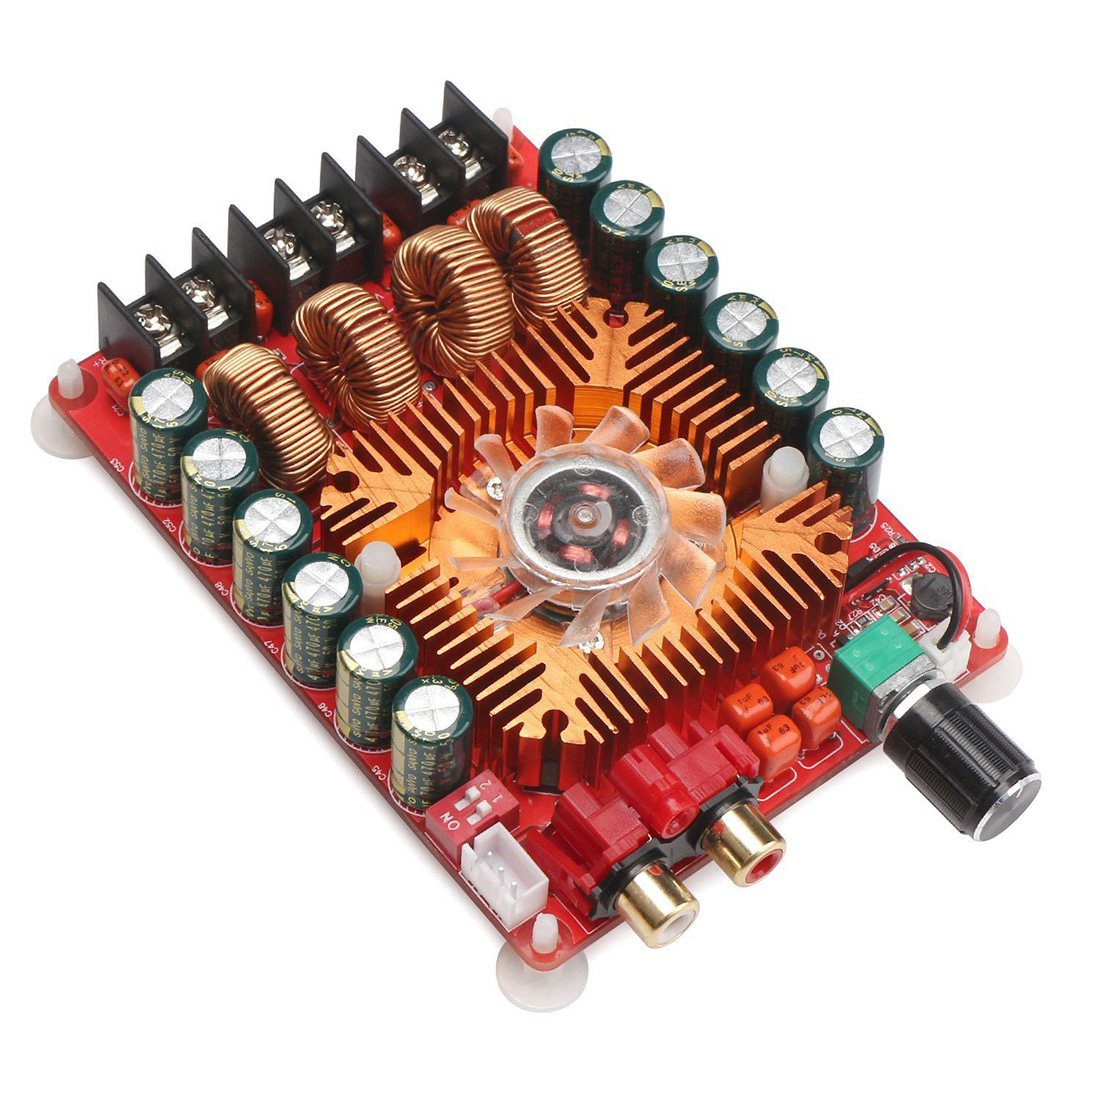 TDA7498E 2X160 w ערוץ כפול אודיו מגבר לוח, תמיכת BTL מצב 1X220 w ערוץ אחד, DC 24 v הדיגיטלי סטריאו כוח Amp